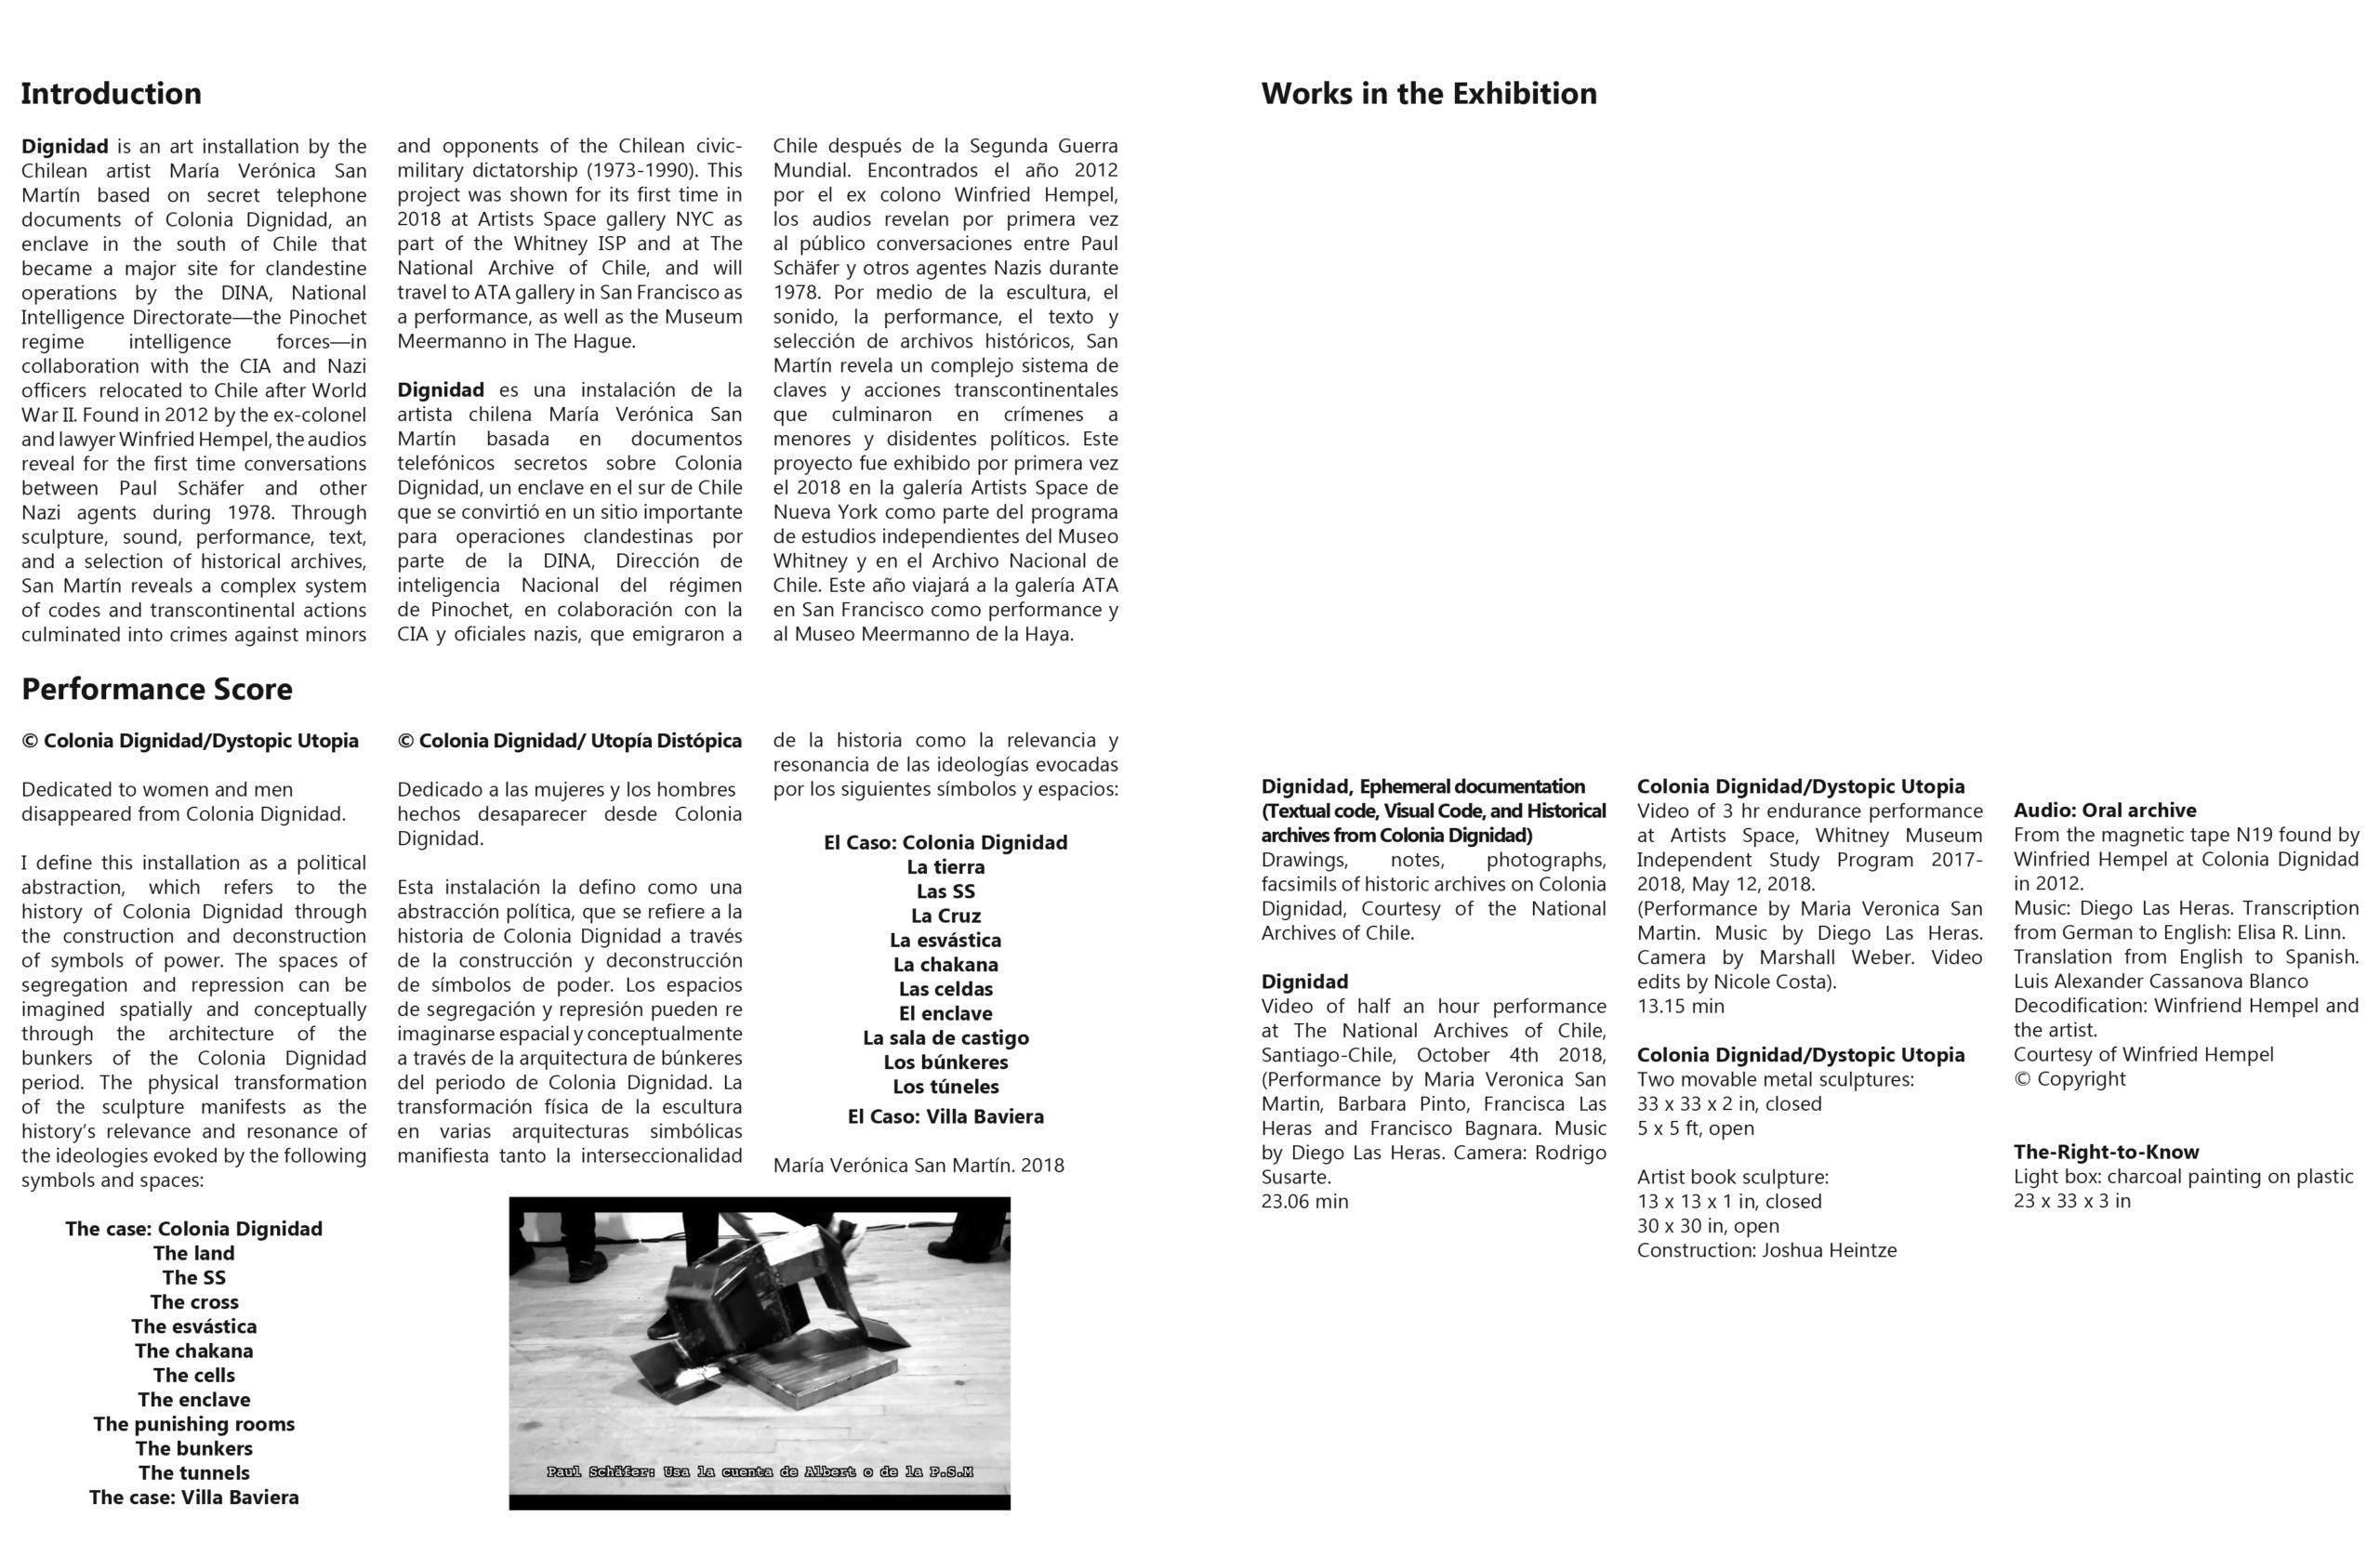 brochure spread with exhibition checklist of works exhibited